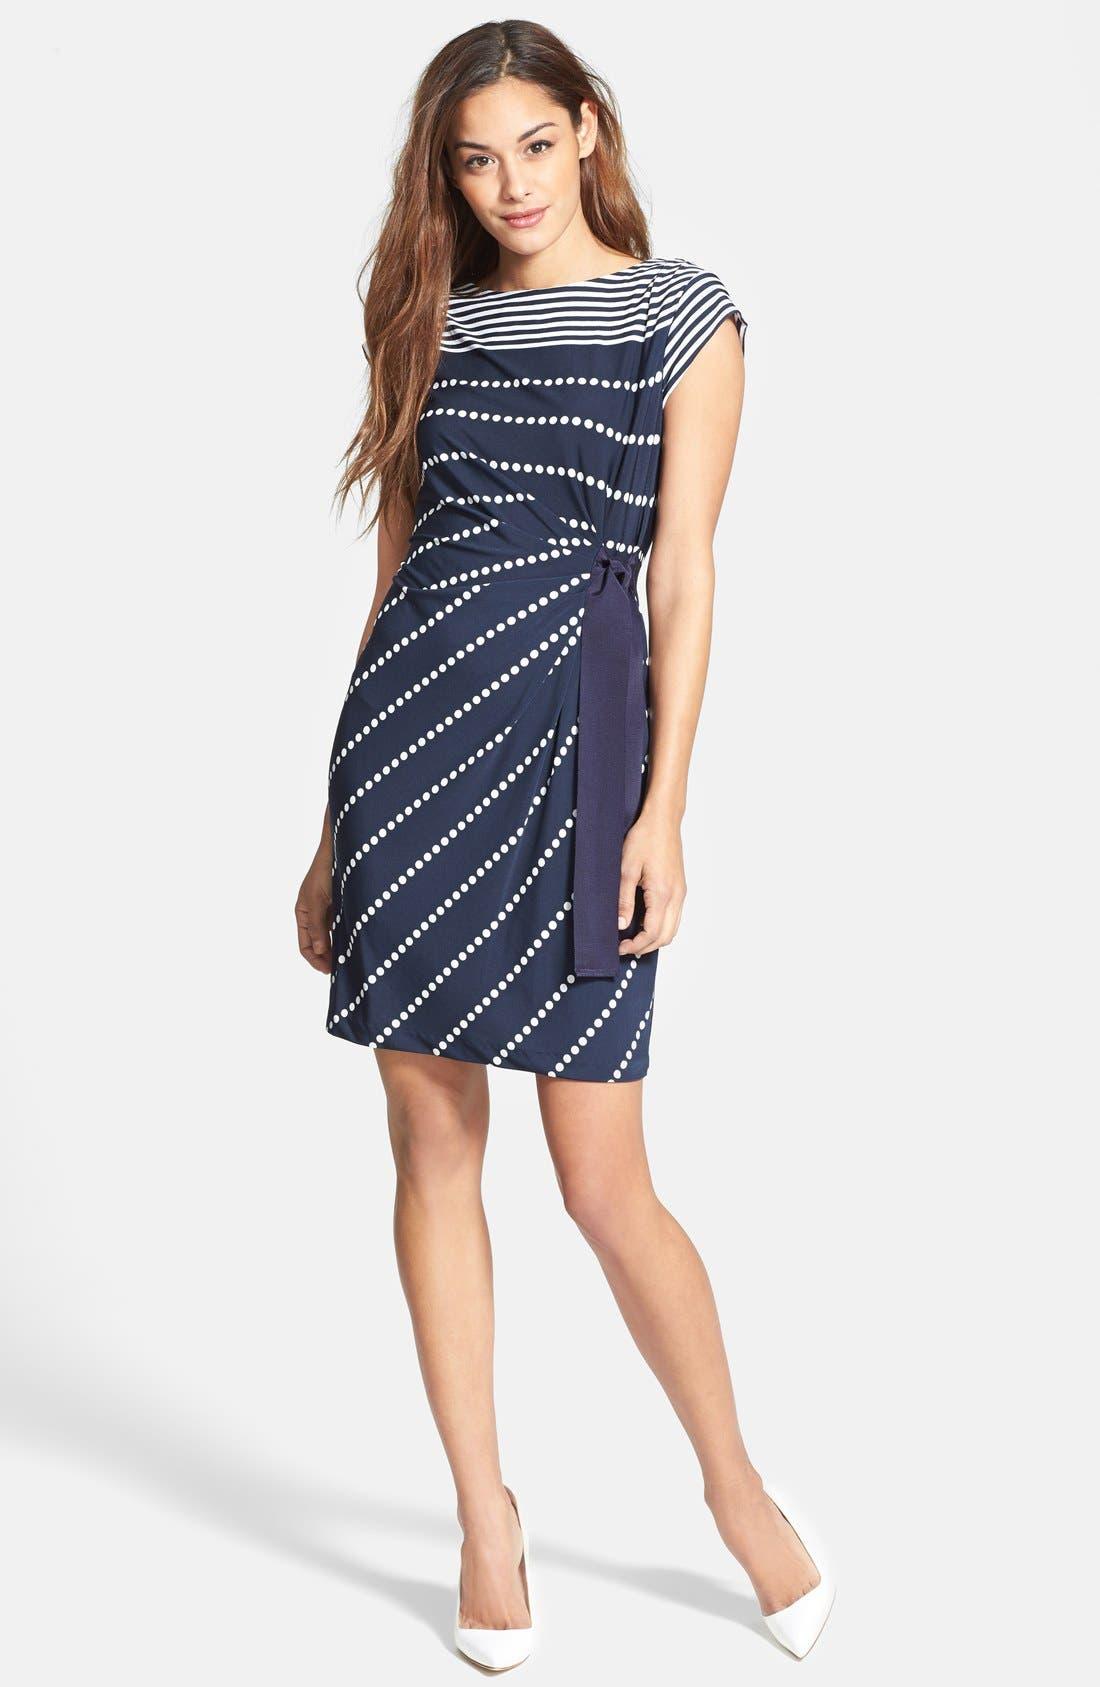 Alternate Image 1 Selected - Taylor Dresses Side Tie Print Jersey Sheath Dress (Petite)